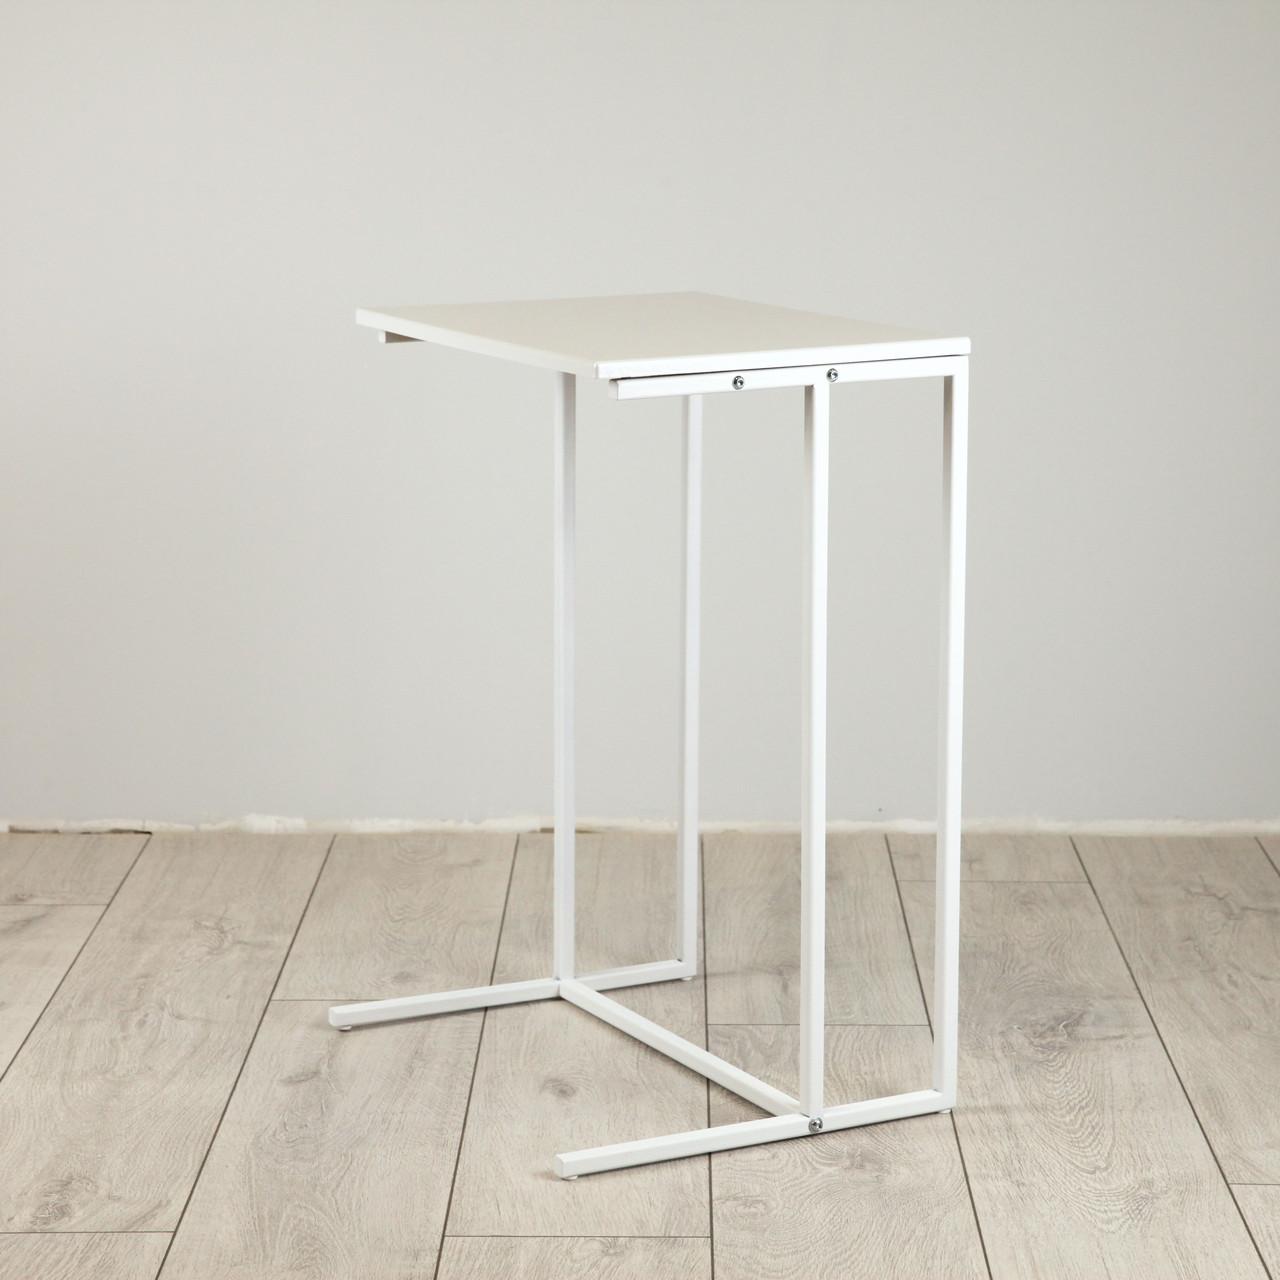 Стол приставной для предметов комфорта и IT-техники Commus Comfort A440 white/white